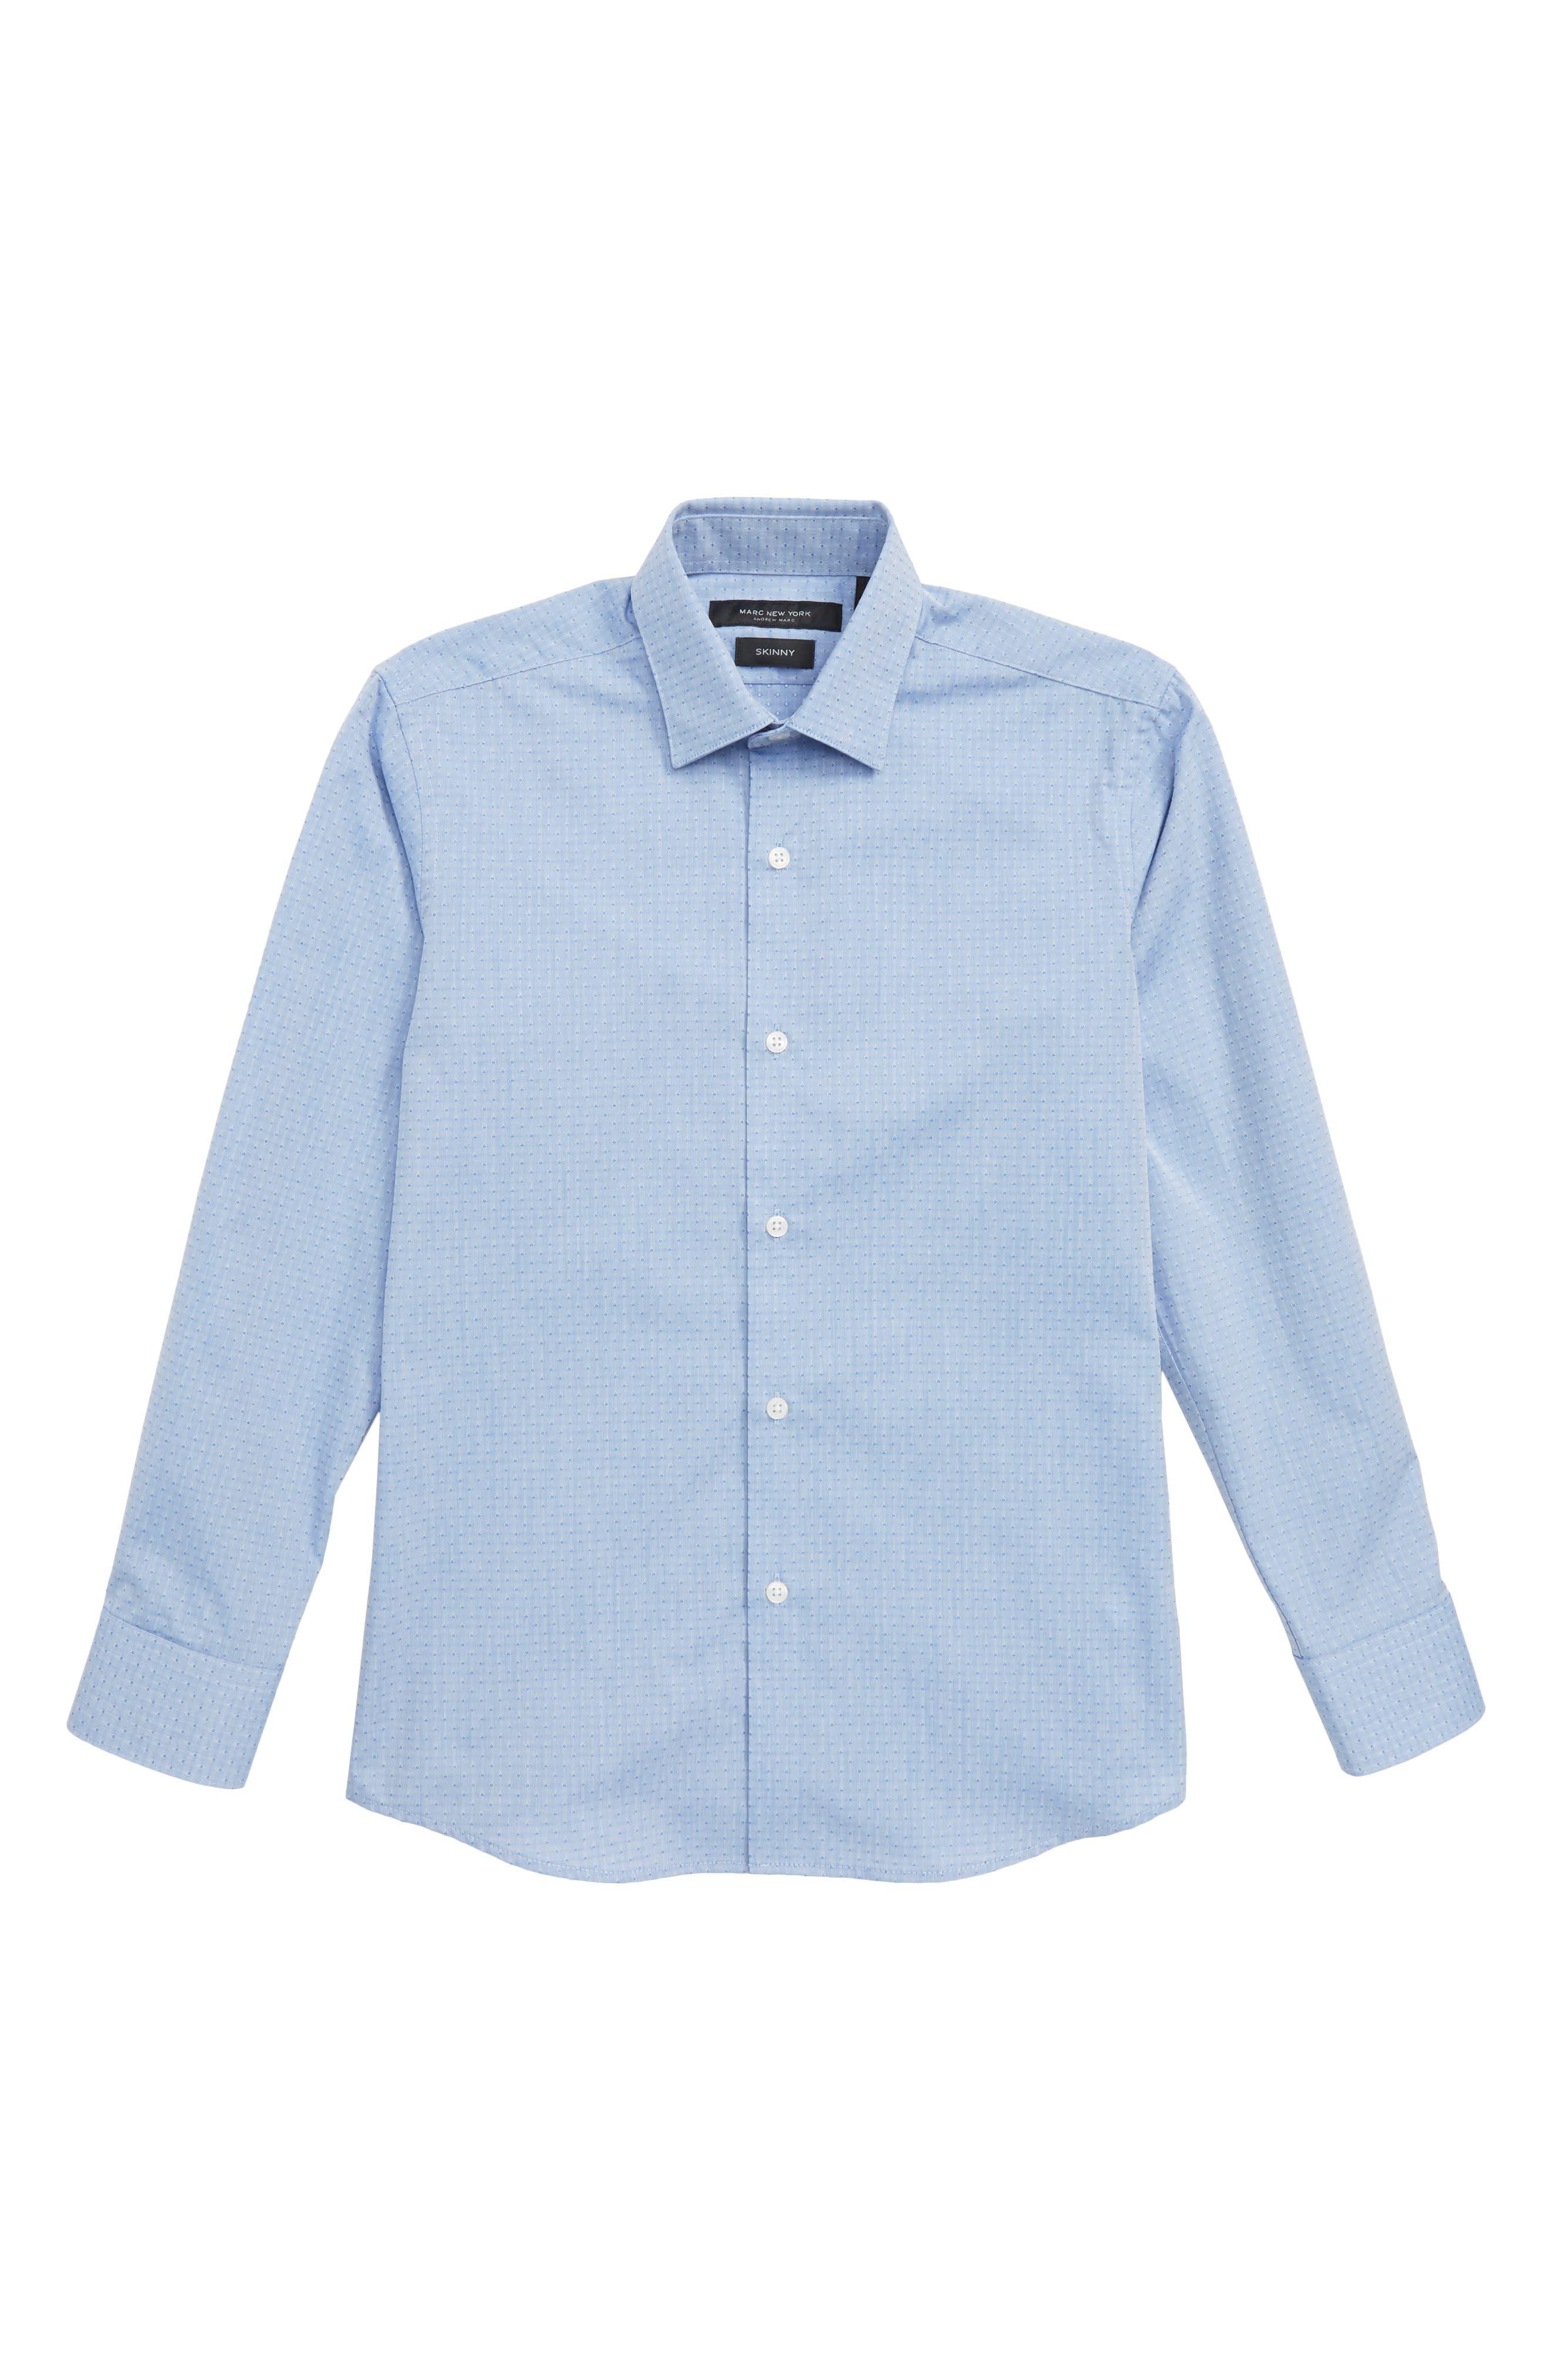 Diamond Print Skinny Fit Dress Shirt,                         Main,                         color, 400